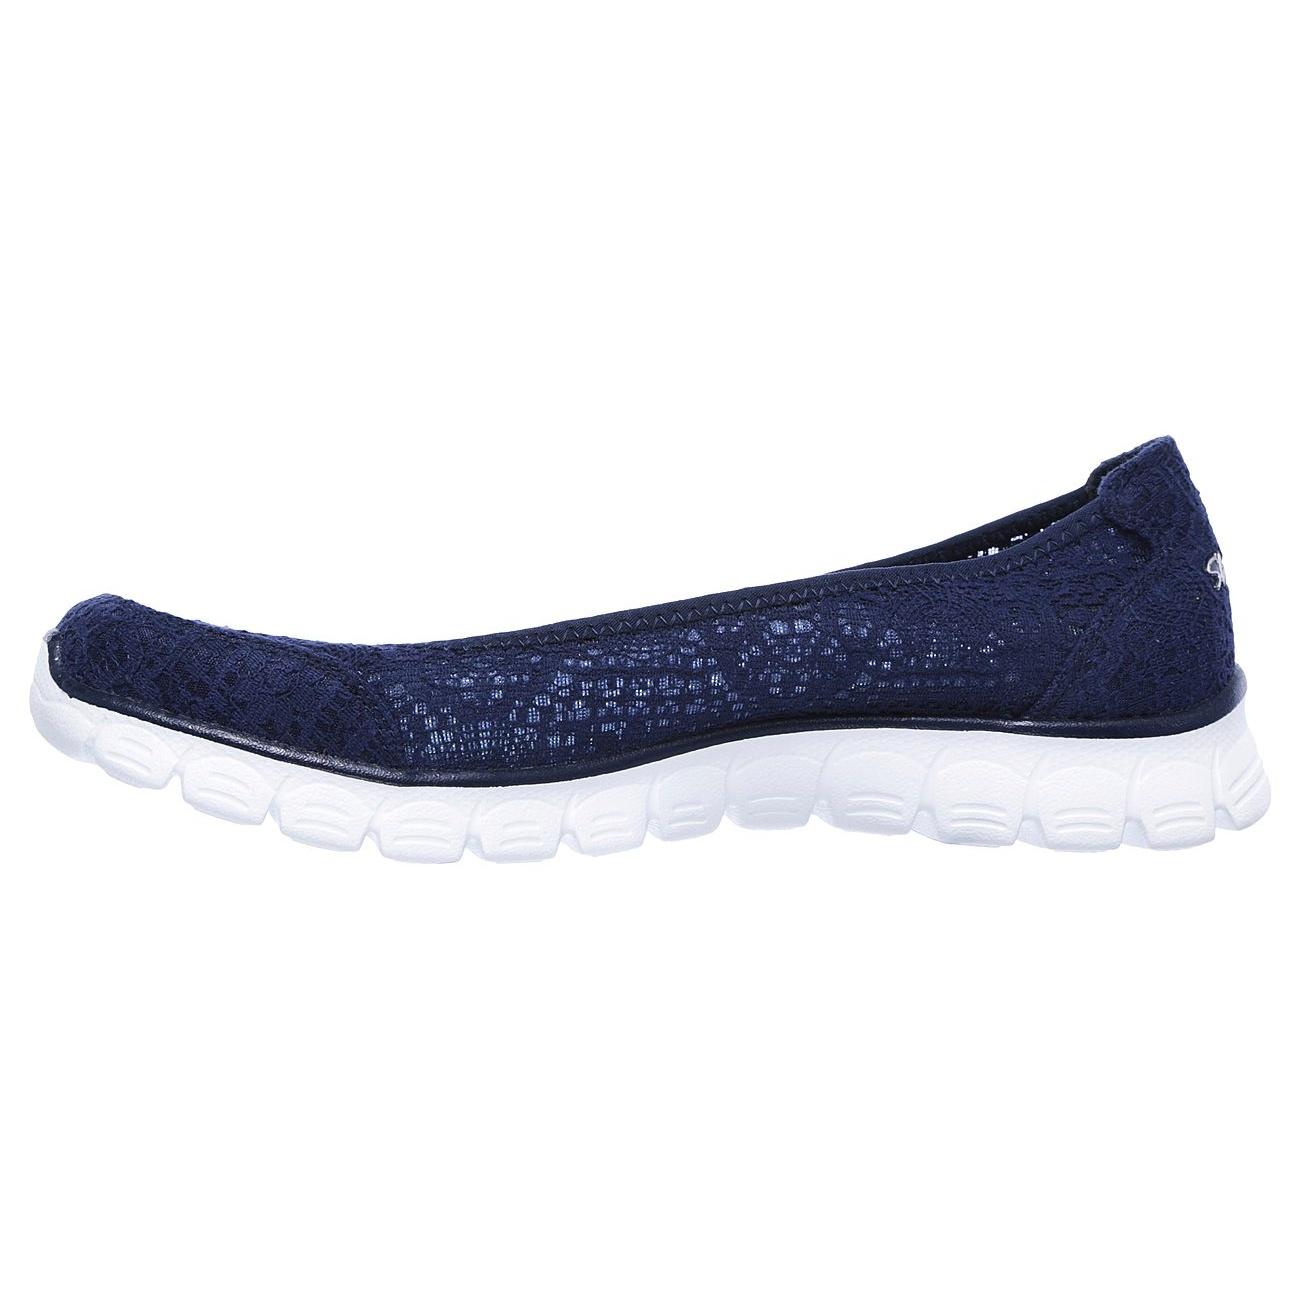 Skechers-Bailarinas-deportivas-de-verano-modelo-EZ-Flex-3-0-Beautify-FS5199 miniatura 6